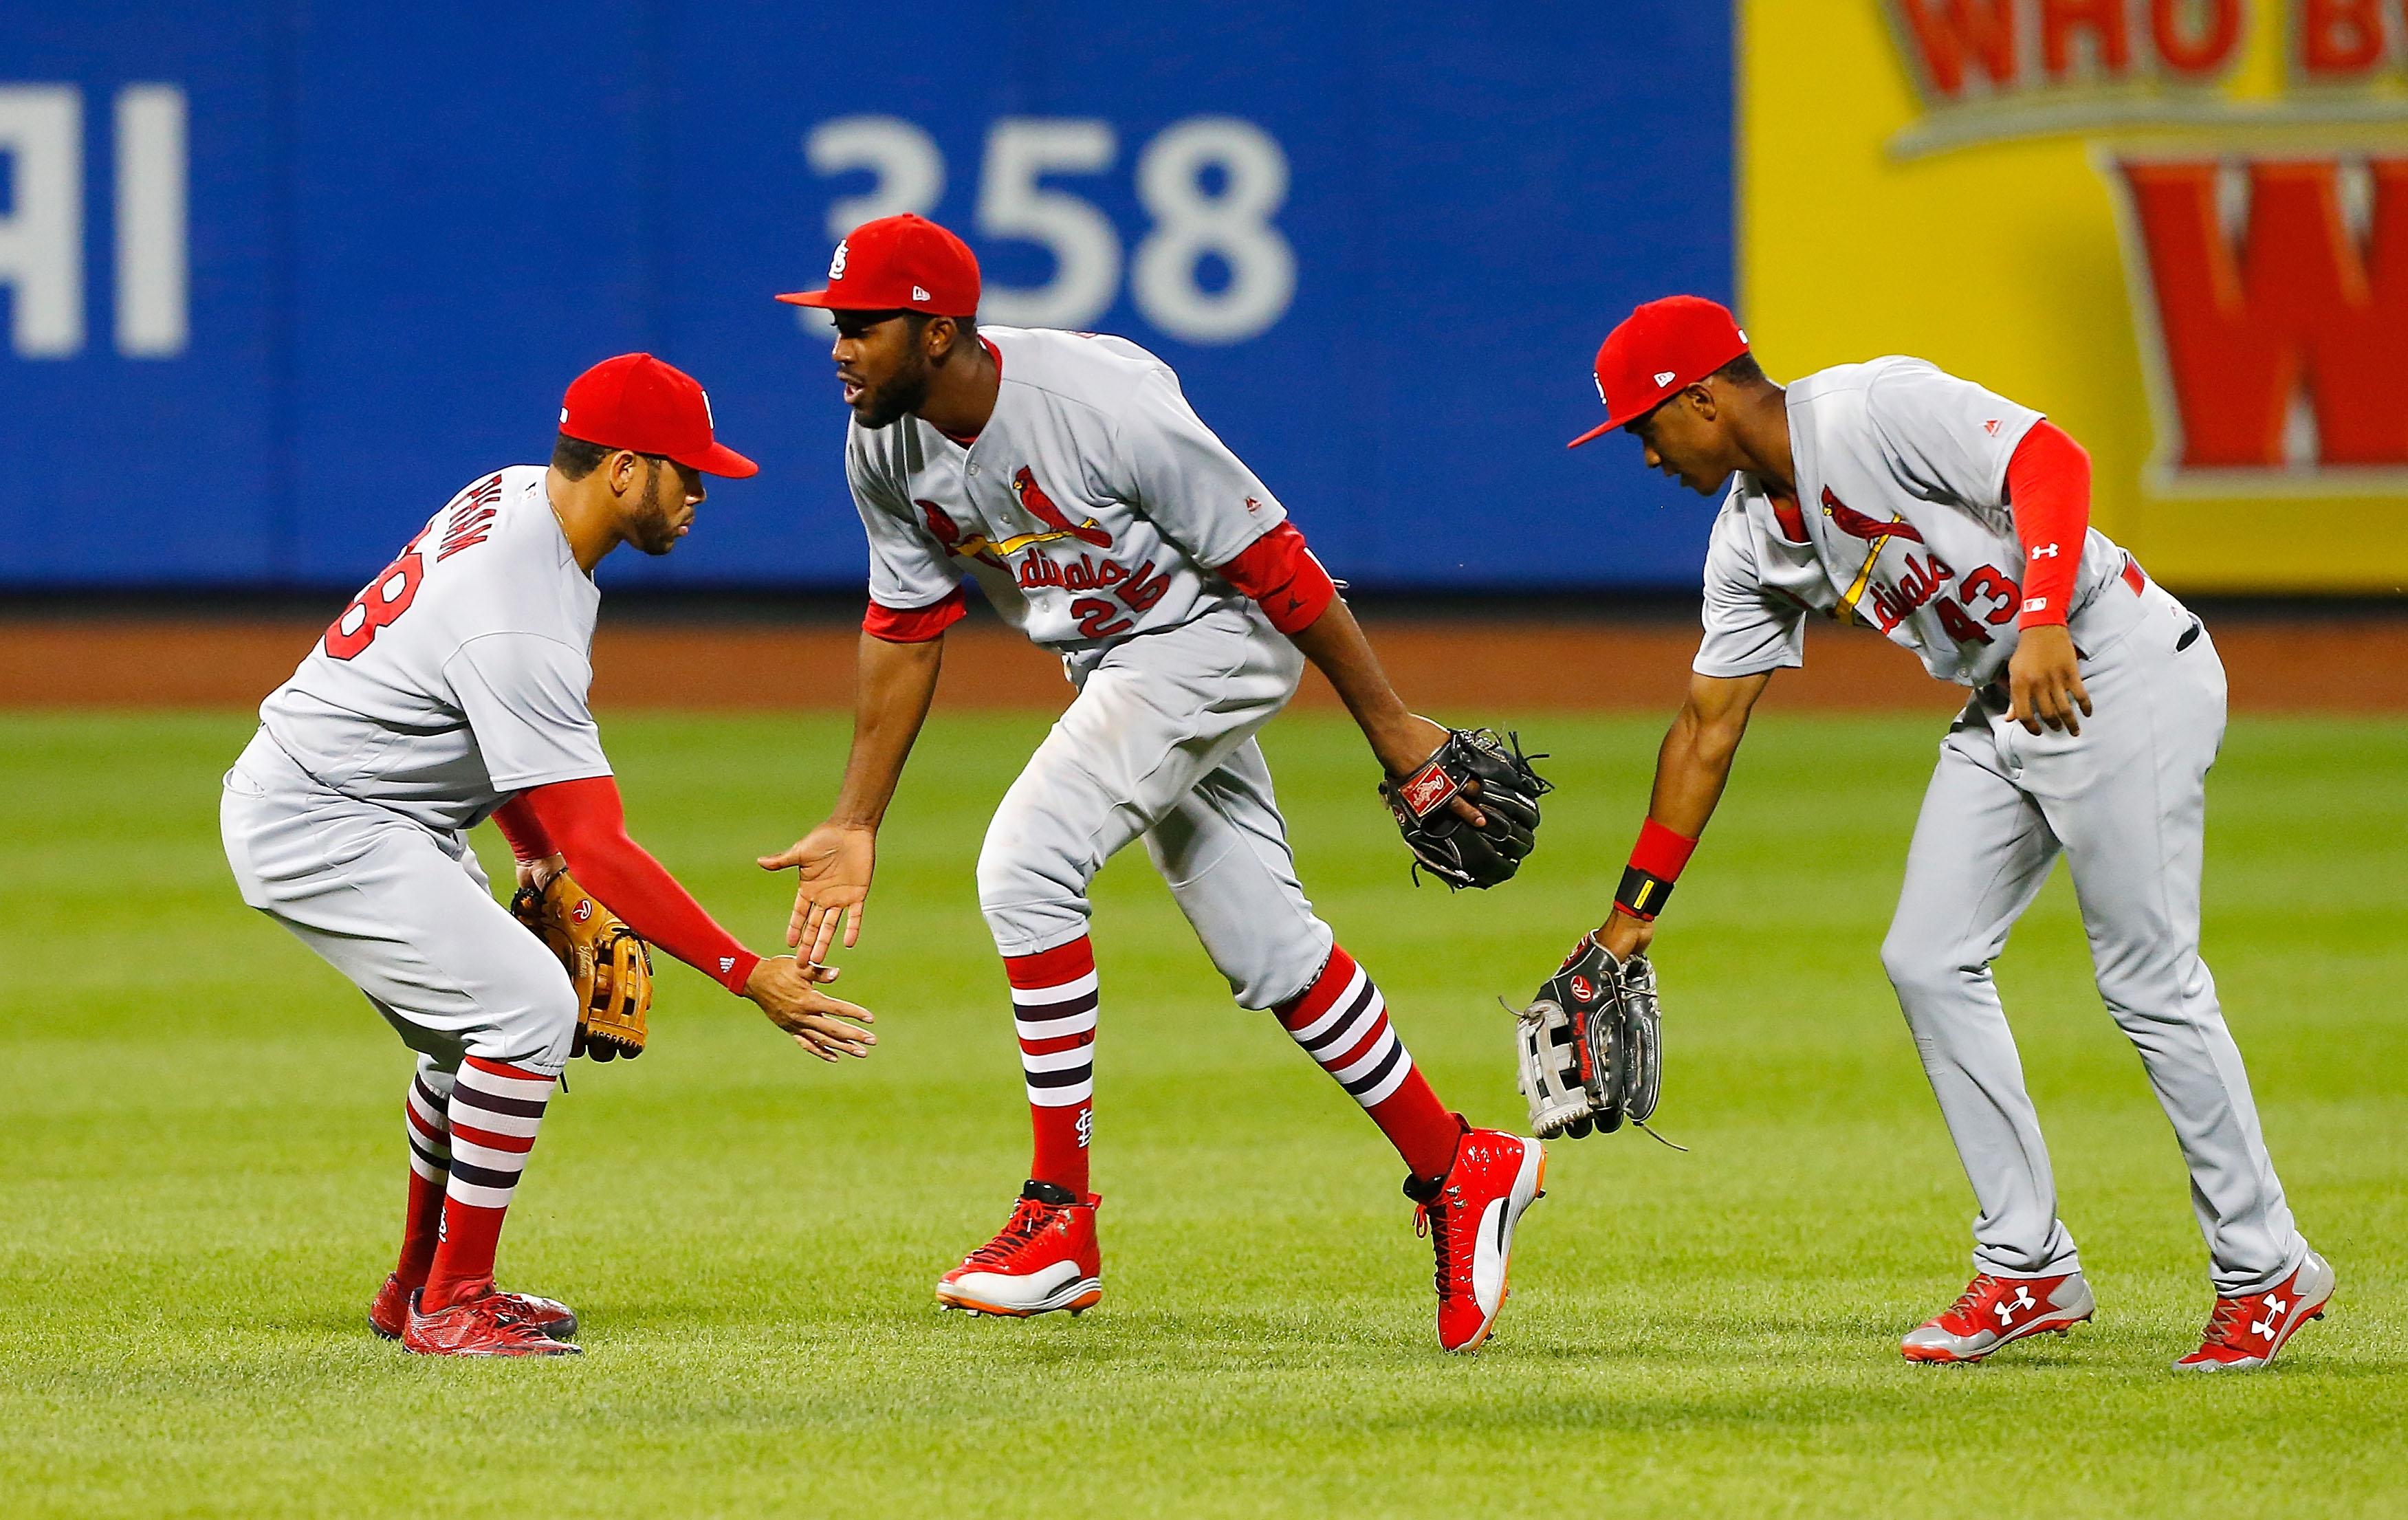 816933624-st-louis-cardinals-v-new-york-mets.jpg